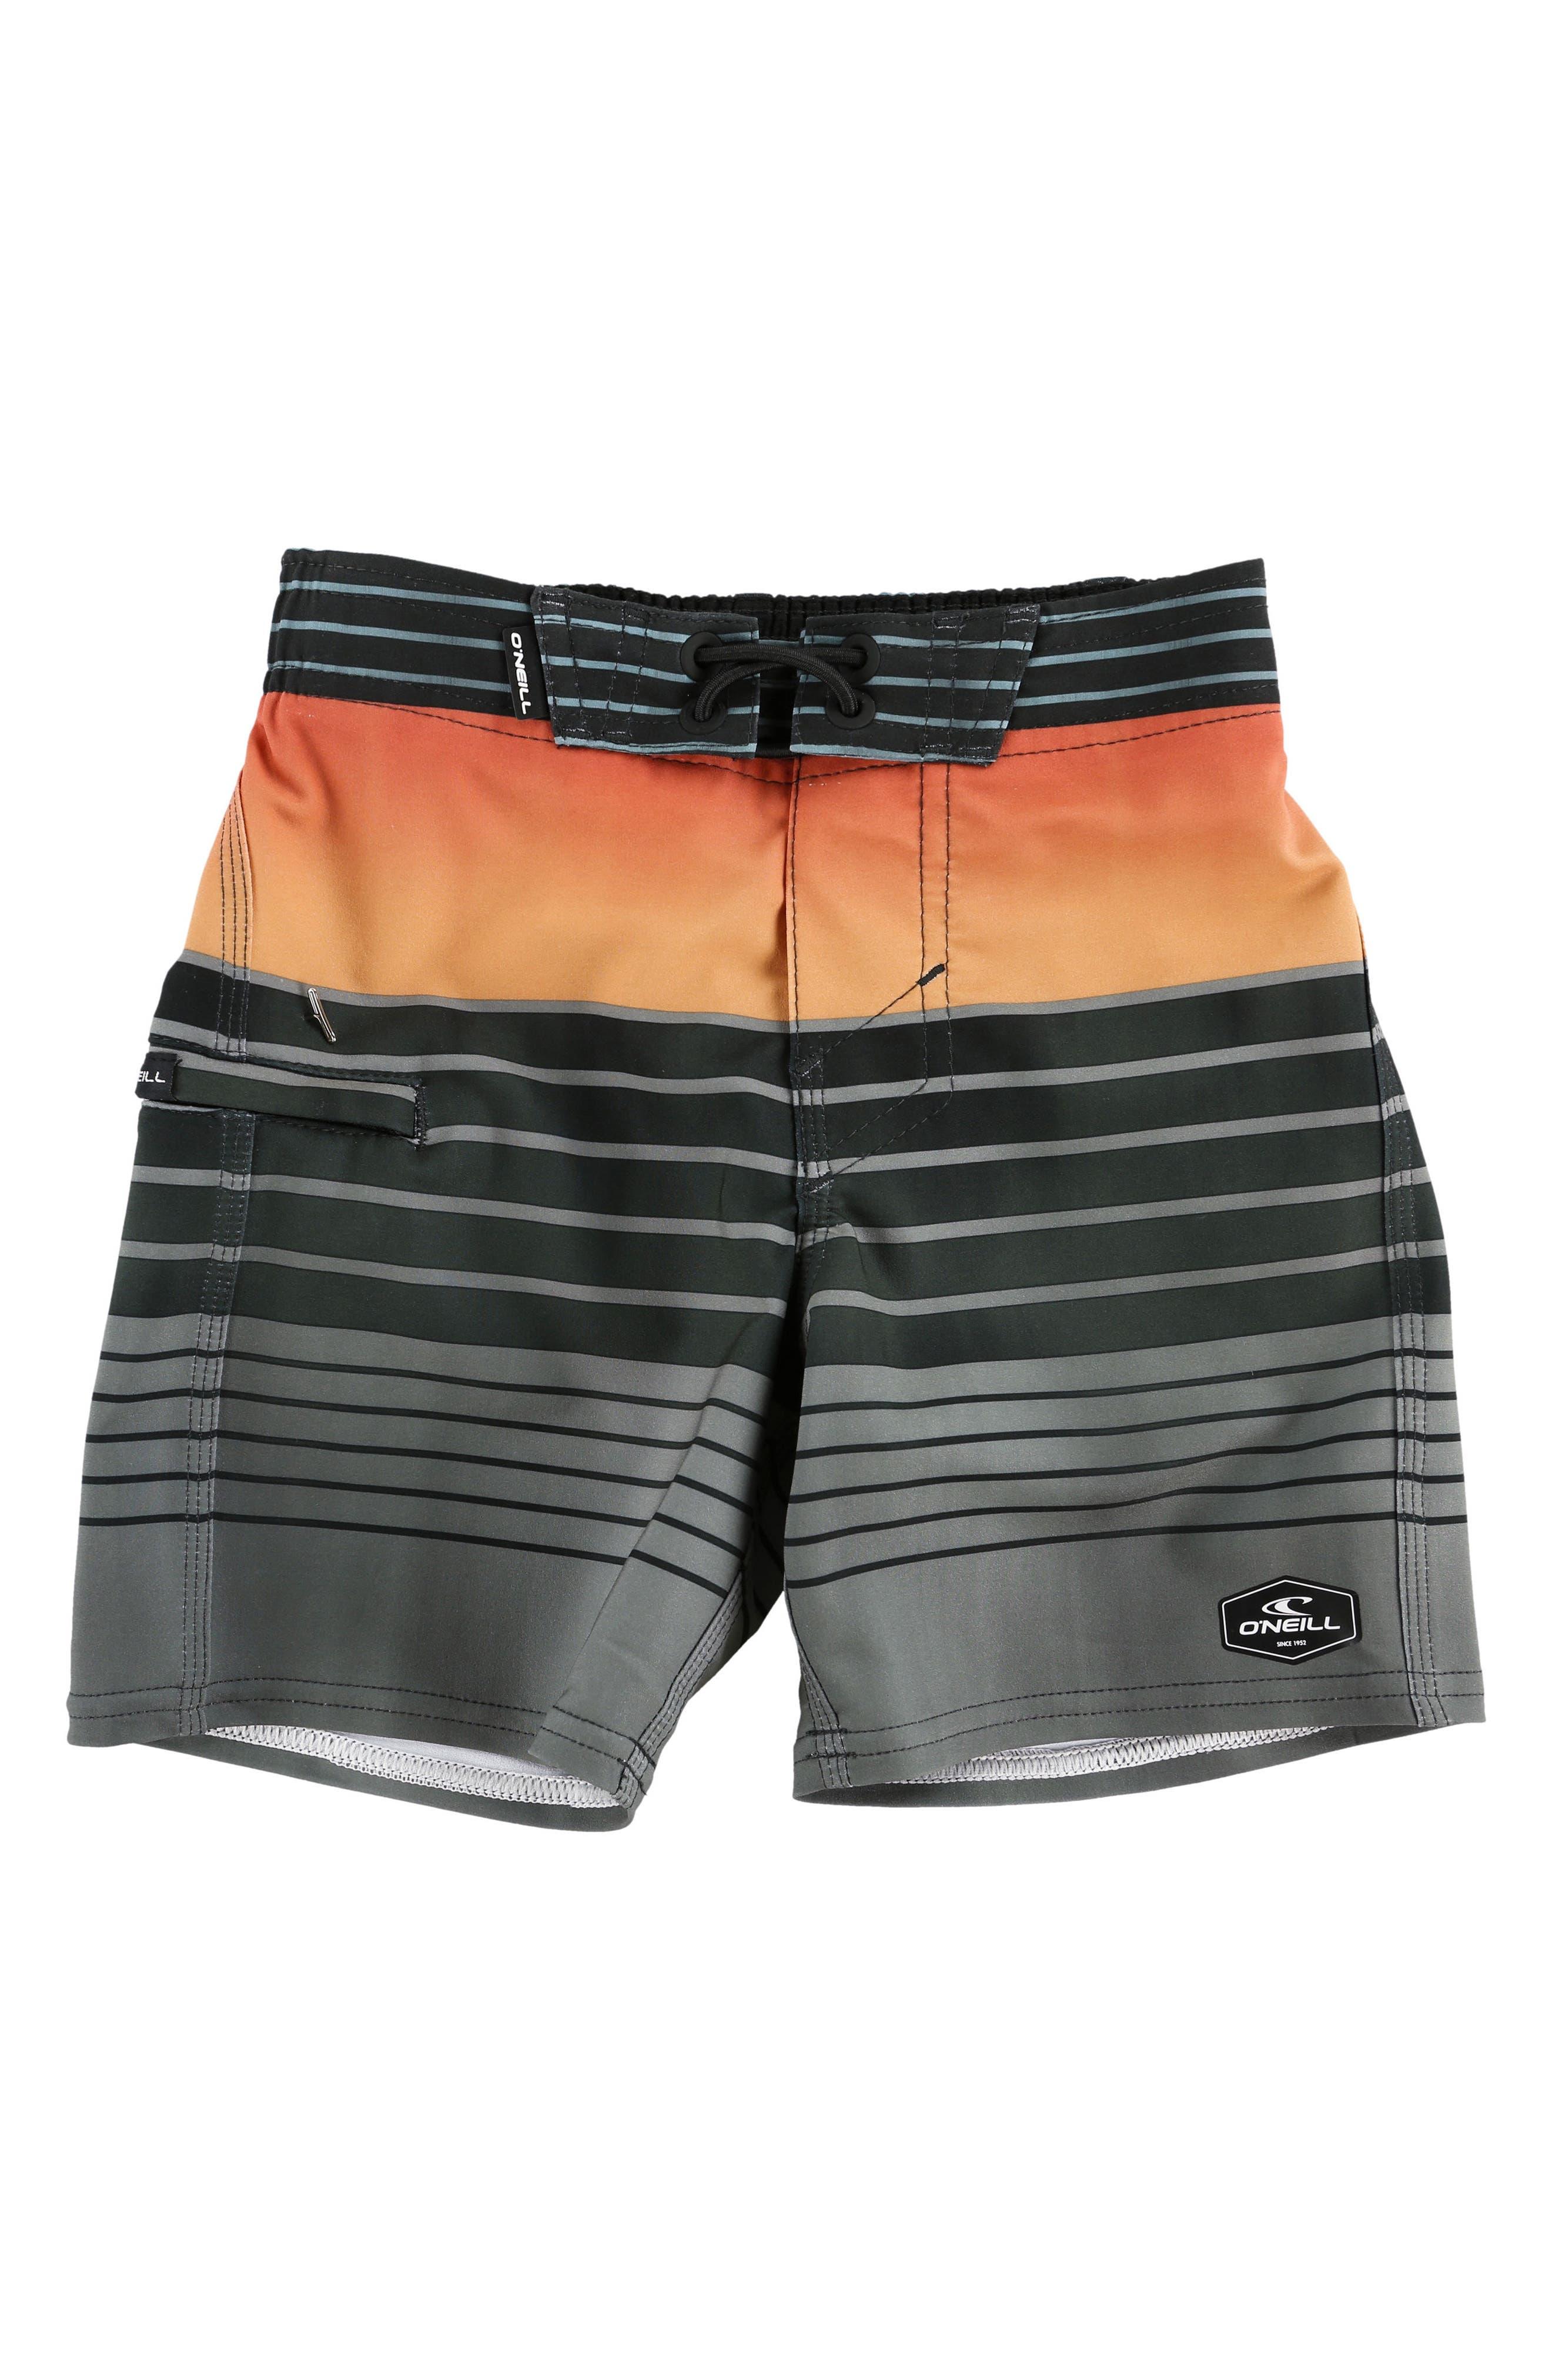 Hyperfreak Heist Board Shorts,                         Main,                         color, ASPHALT